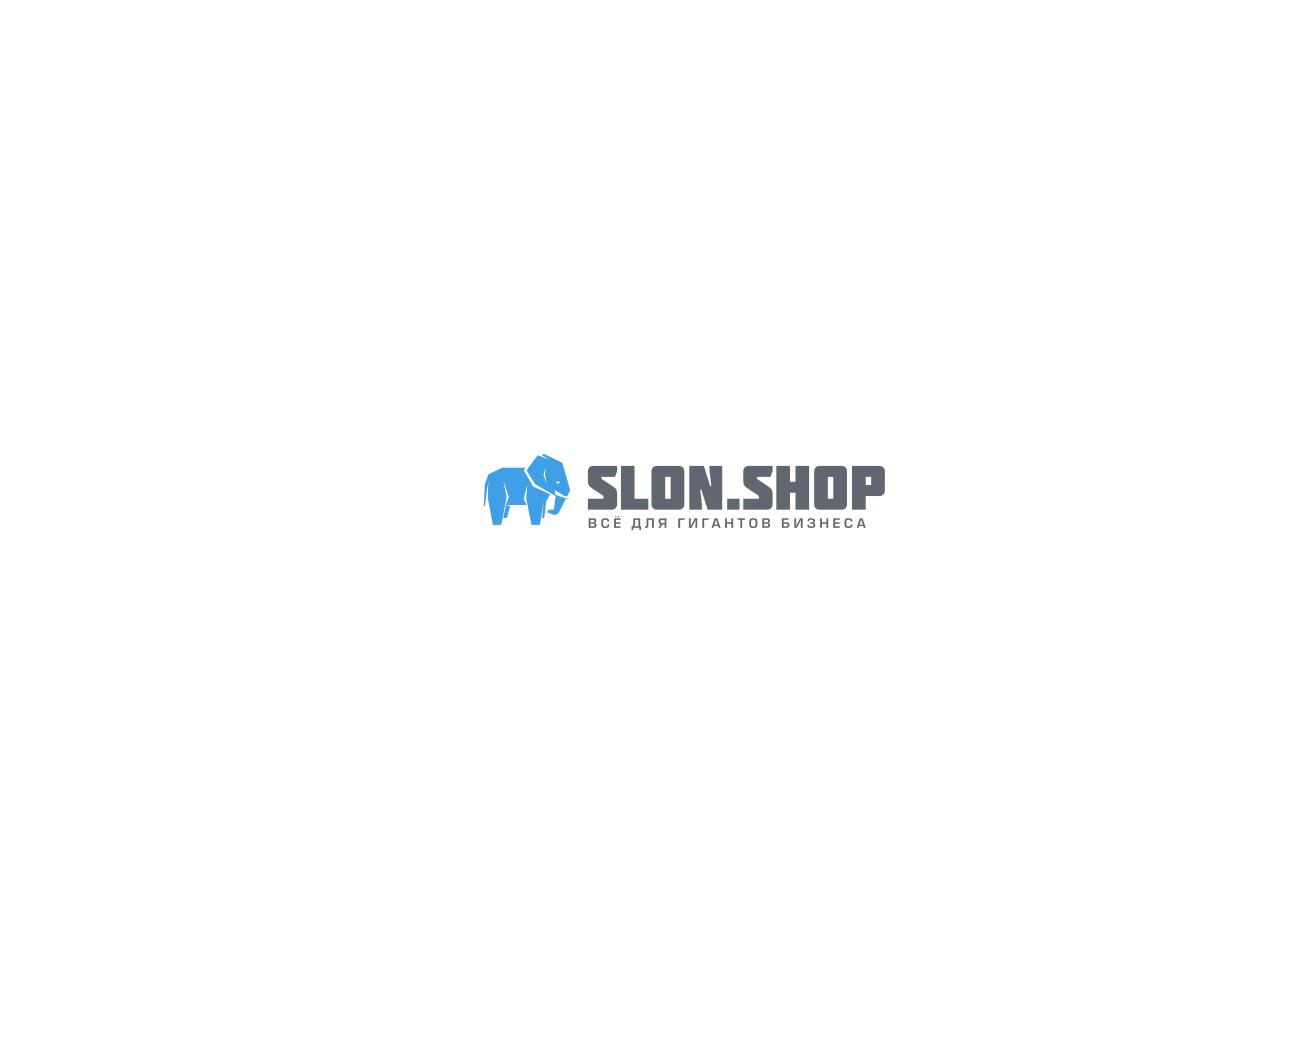 Разработать логотип и фирменный стиль интернет-магазина  фото f_75059917dc592e0b.png